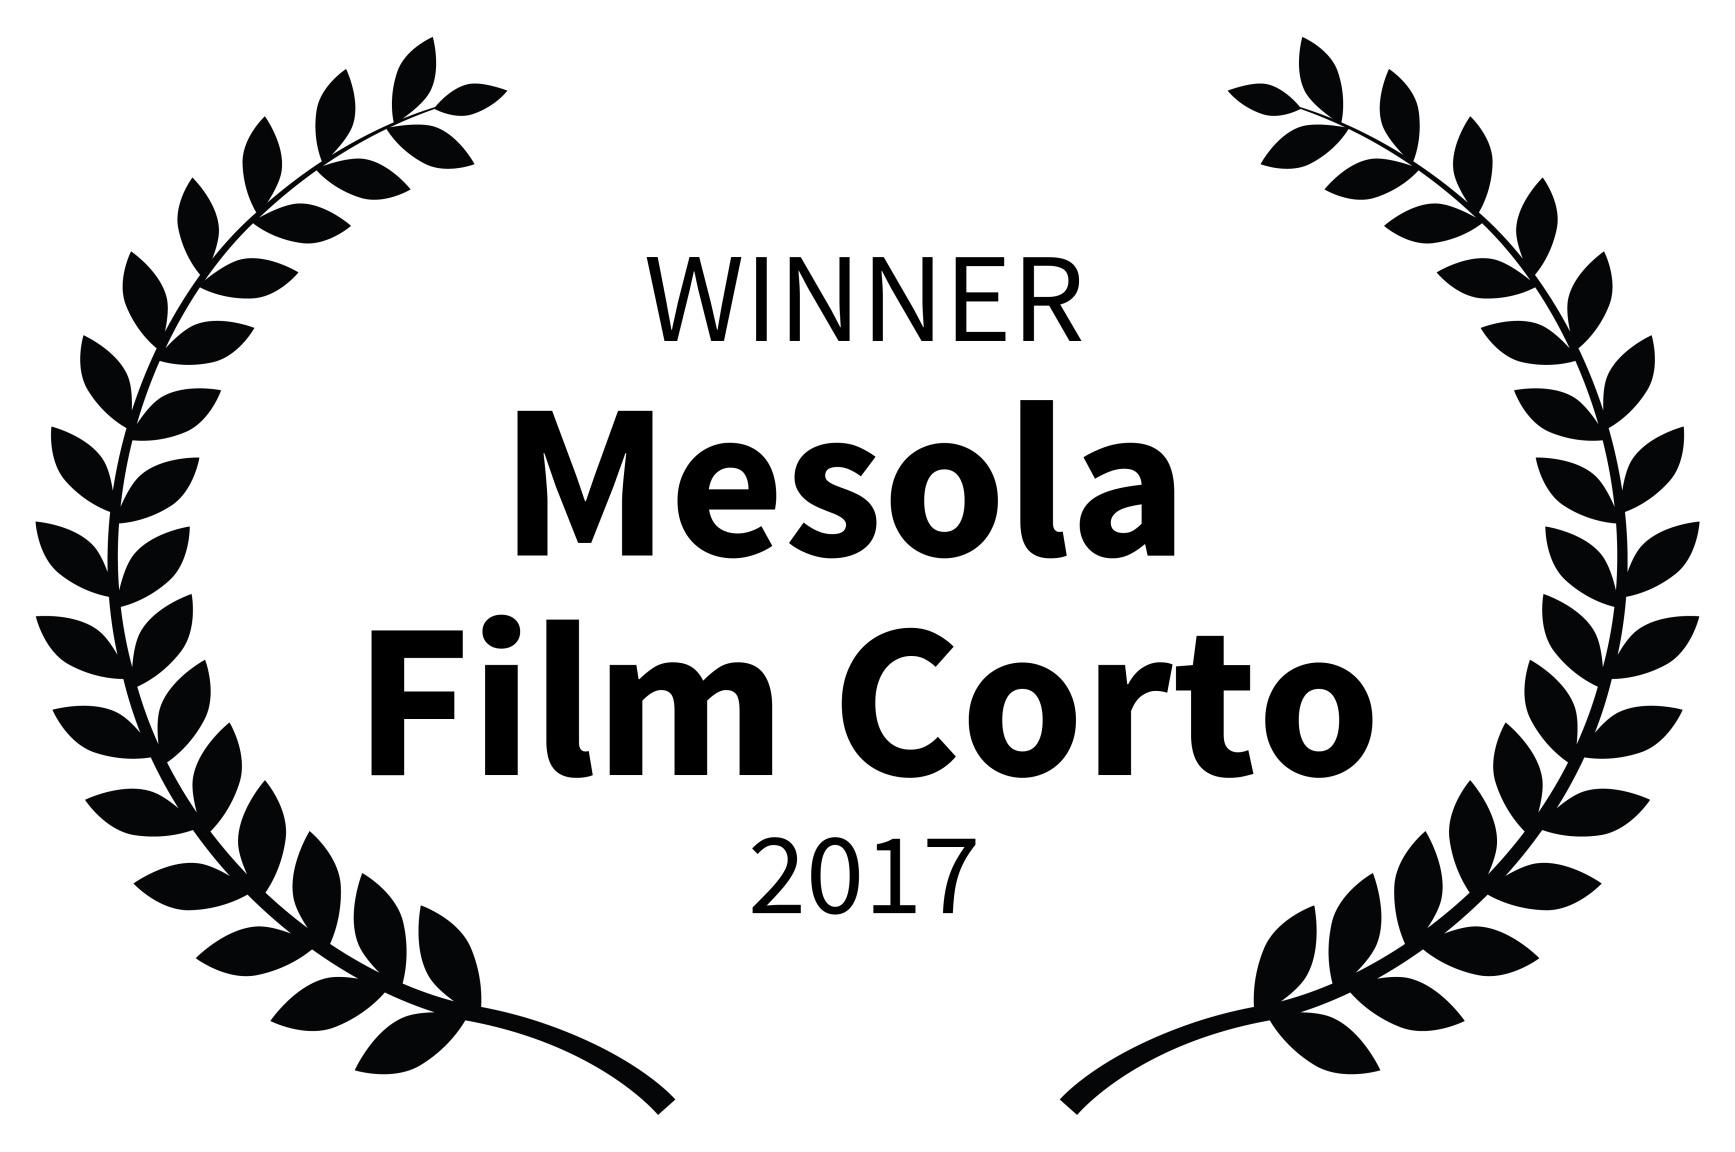 WINNER - Mesola Film Corto - 2017